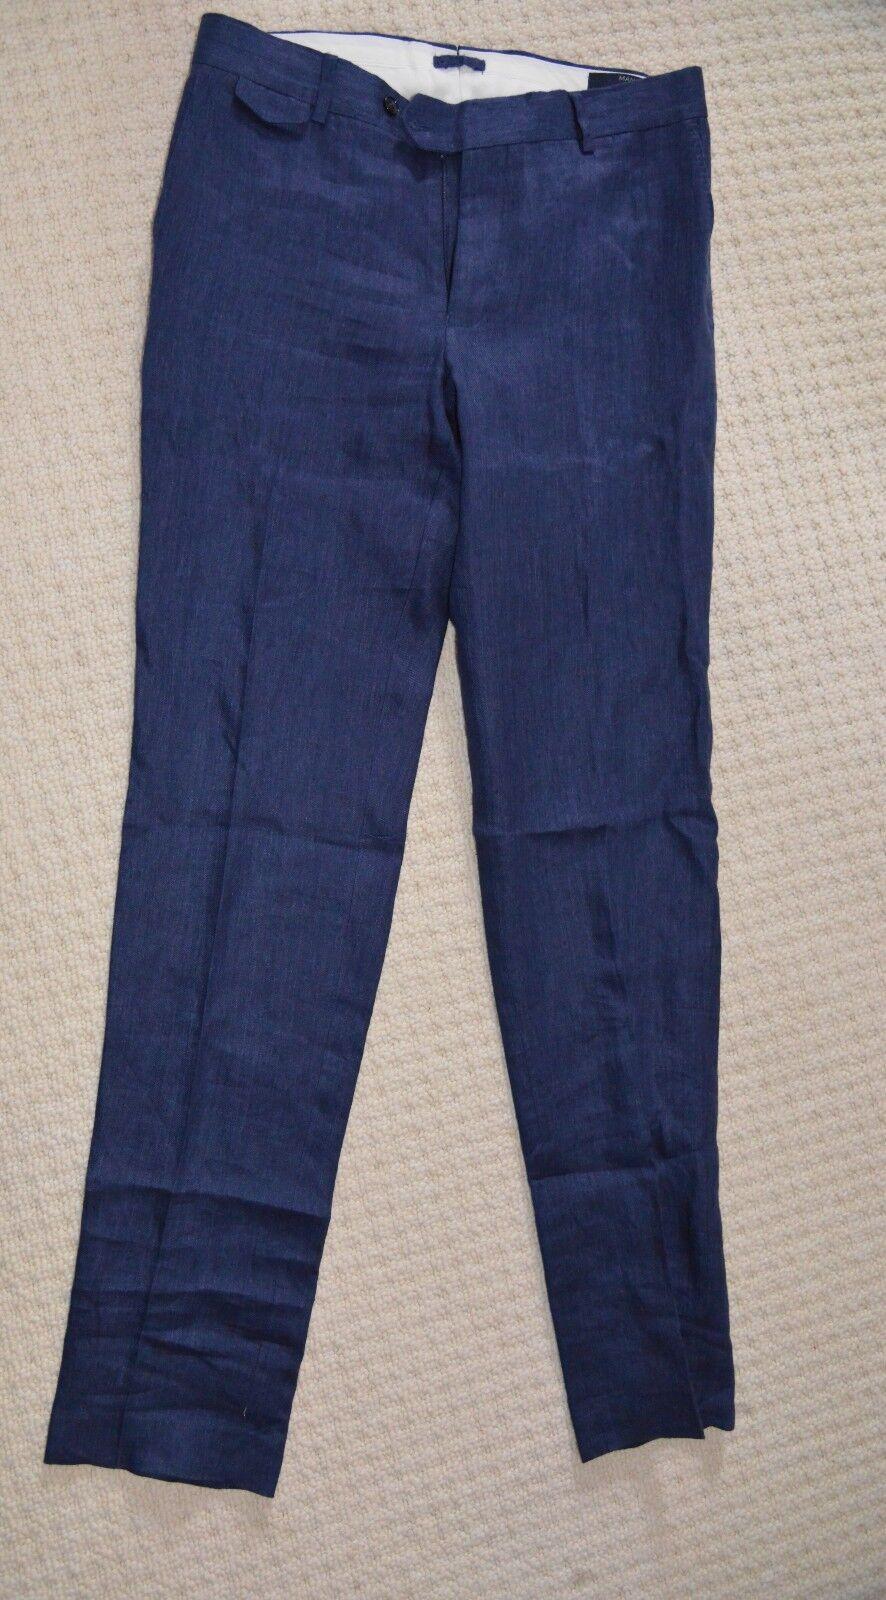 New Mango Man Tailored Slim Fit bluee Linen Trouser Flat Front Formal Pants W30